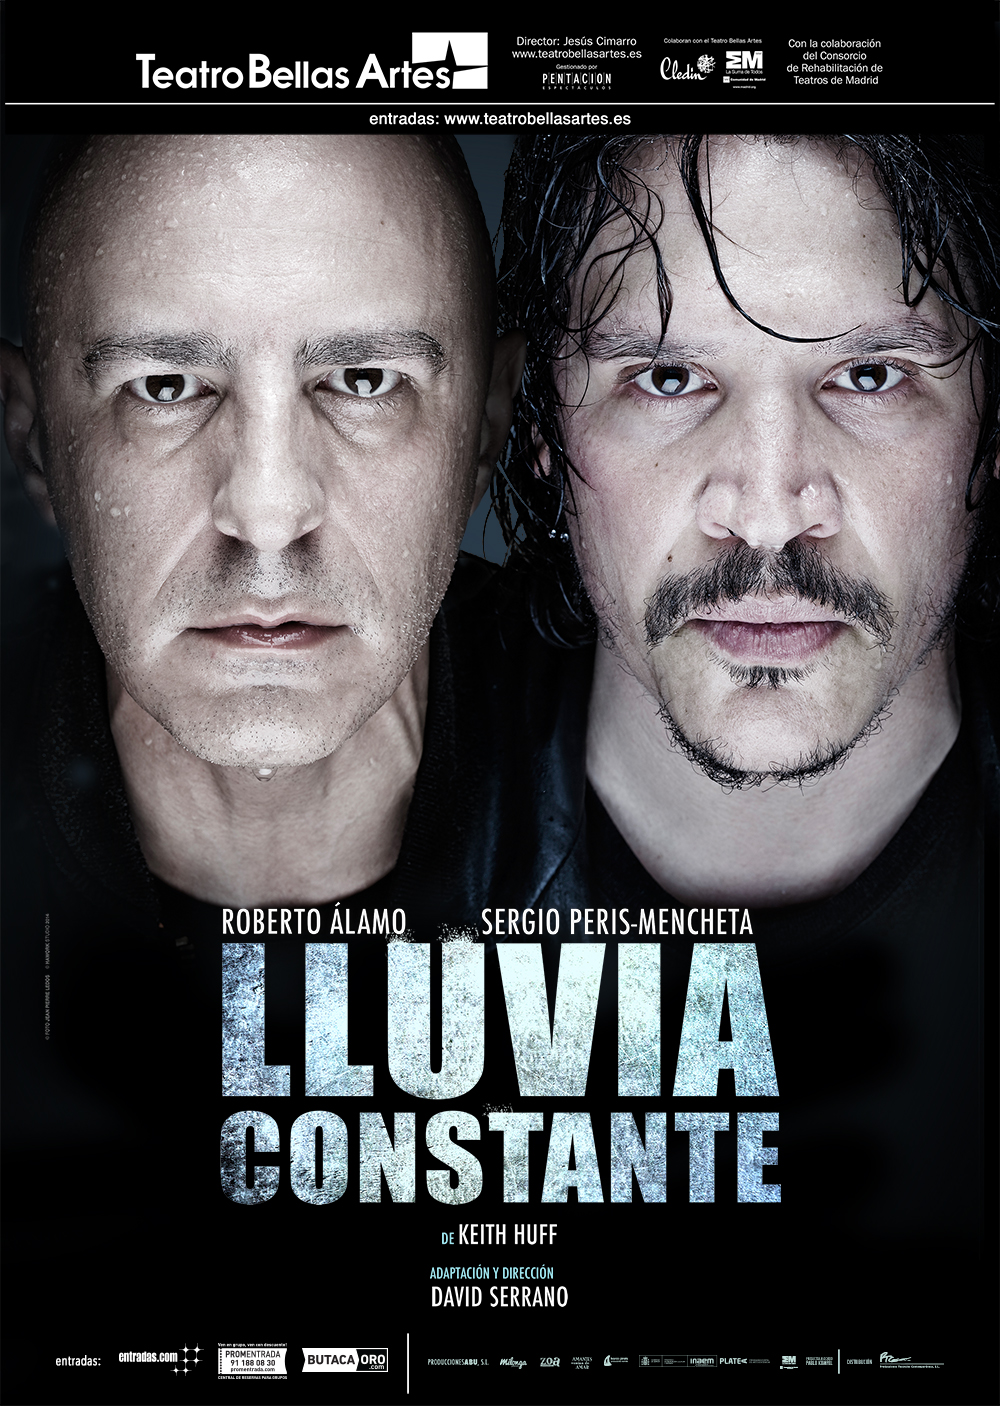 TBA_cartel_lluvia_AC